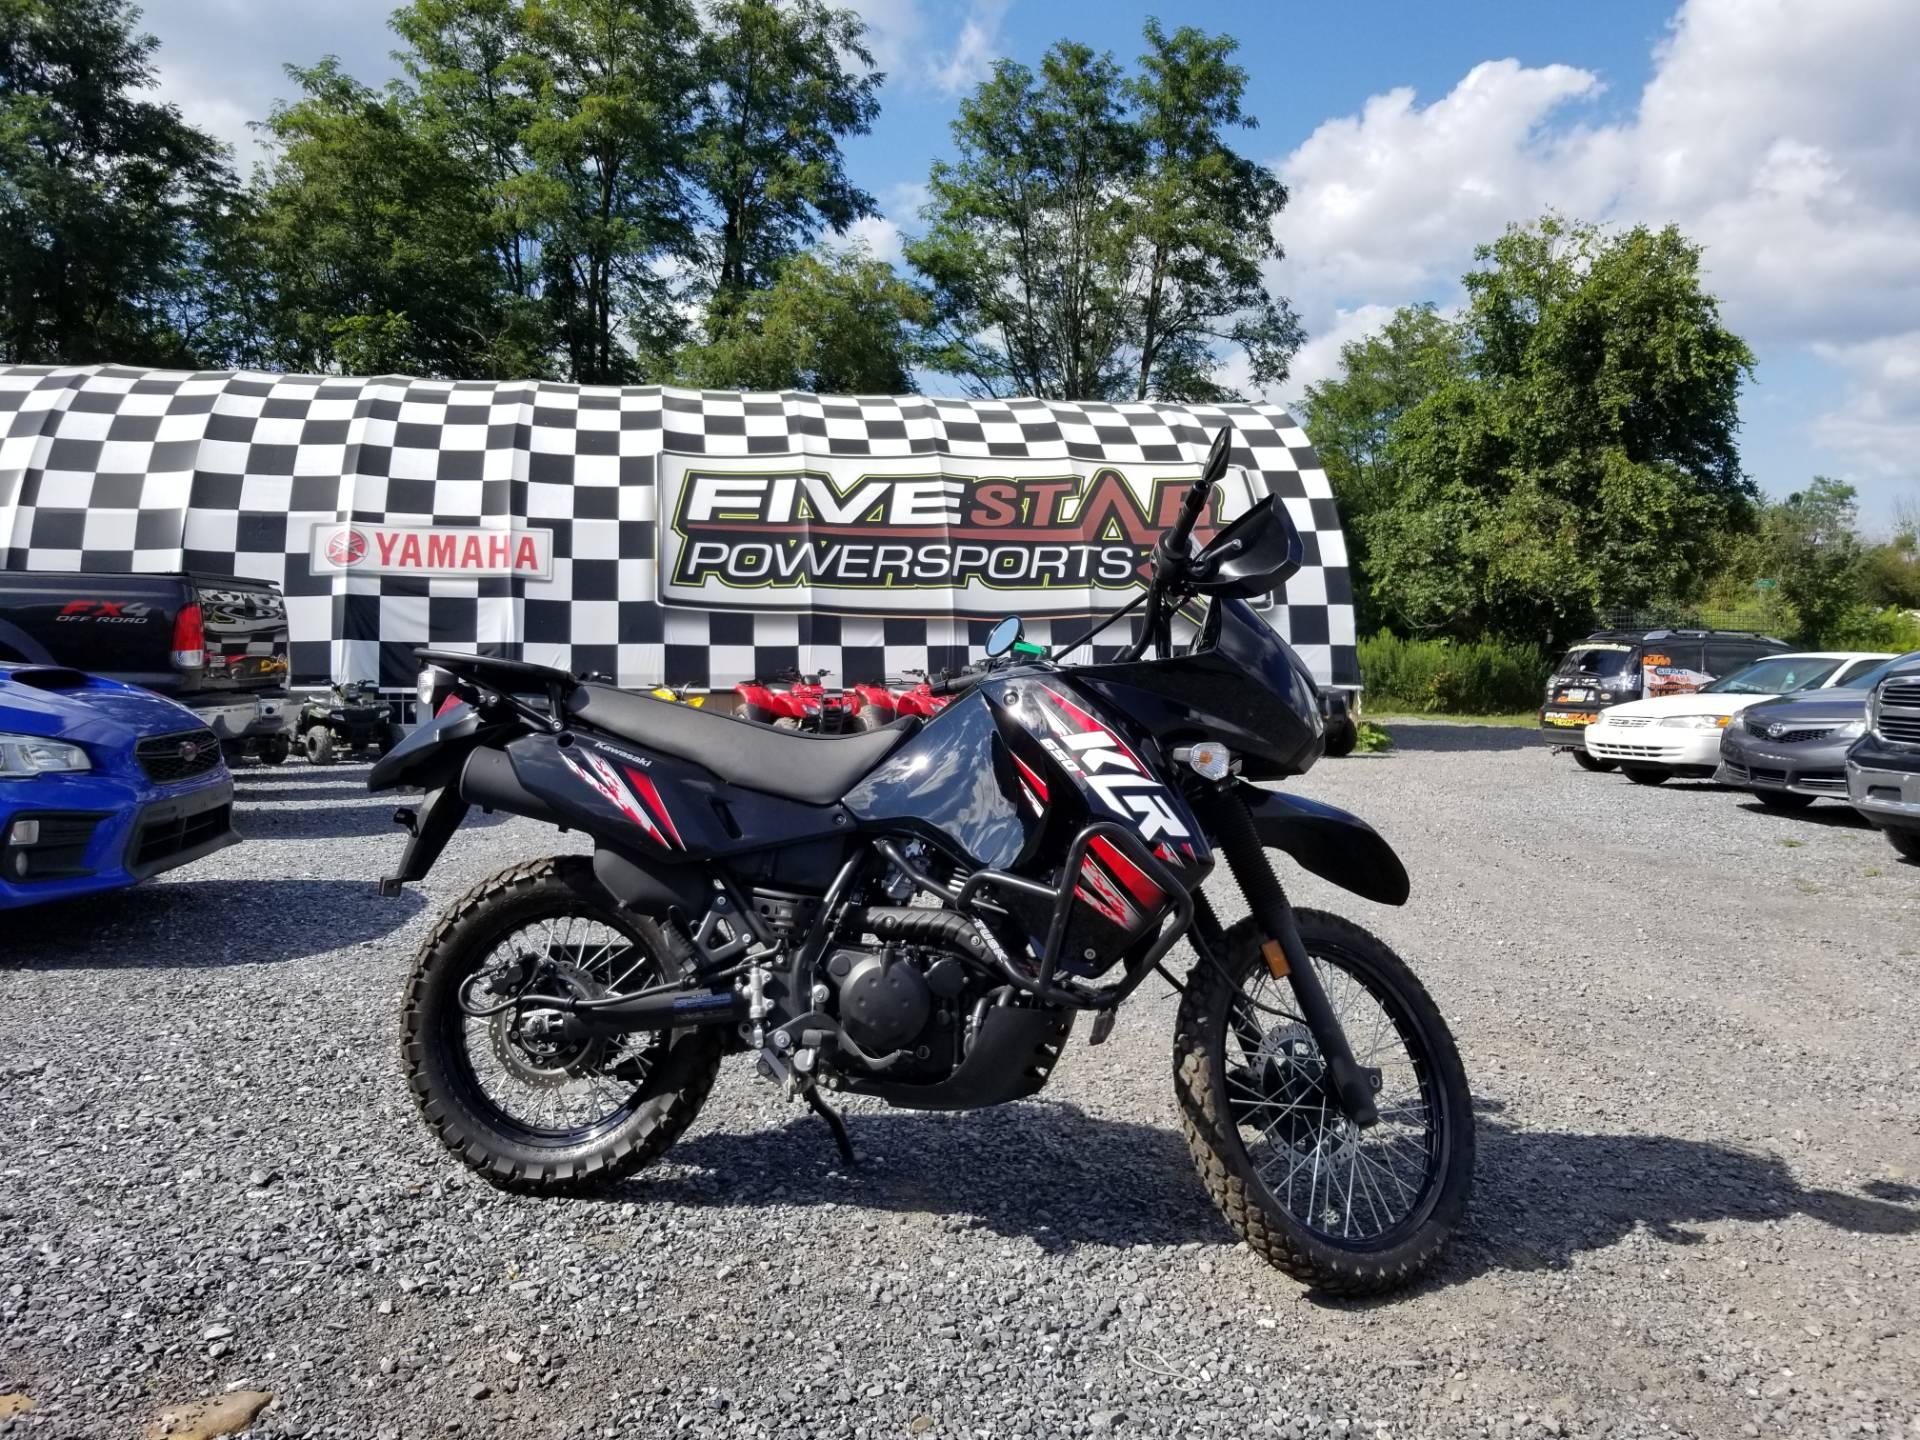 Used 2013 Kawasaki KLR™650 Motorcycles in Duncansville, PA | Stock ...